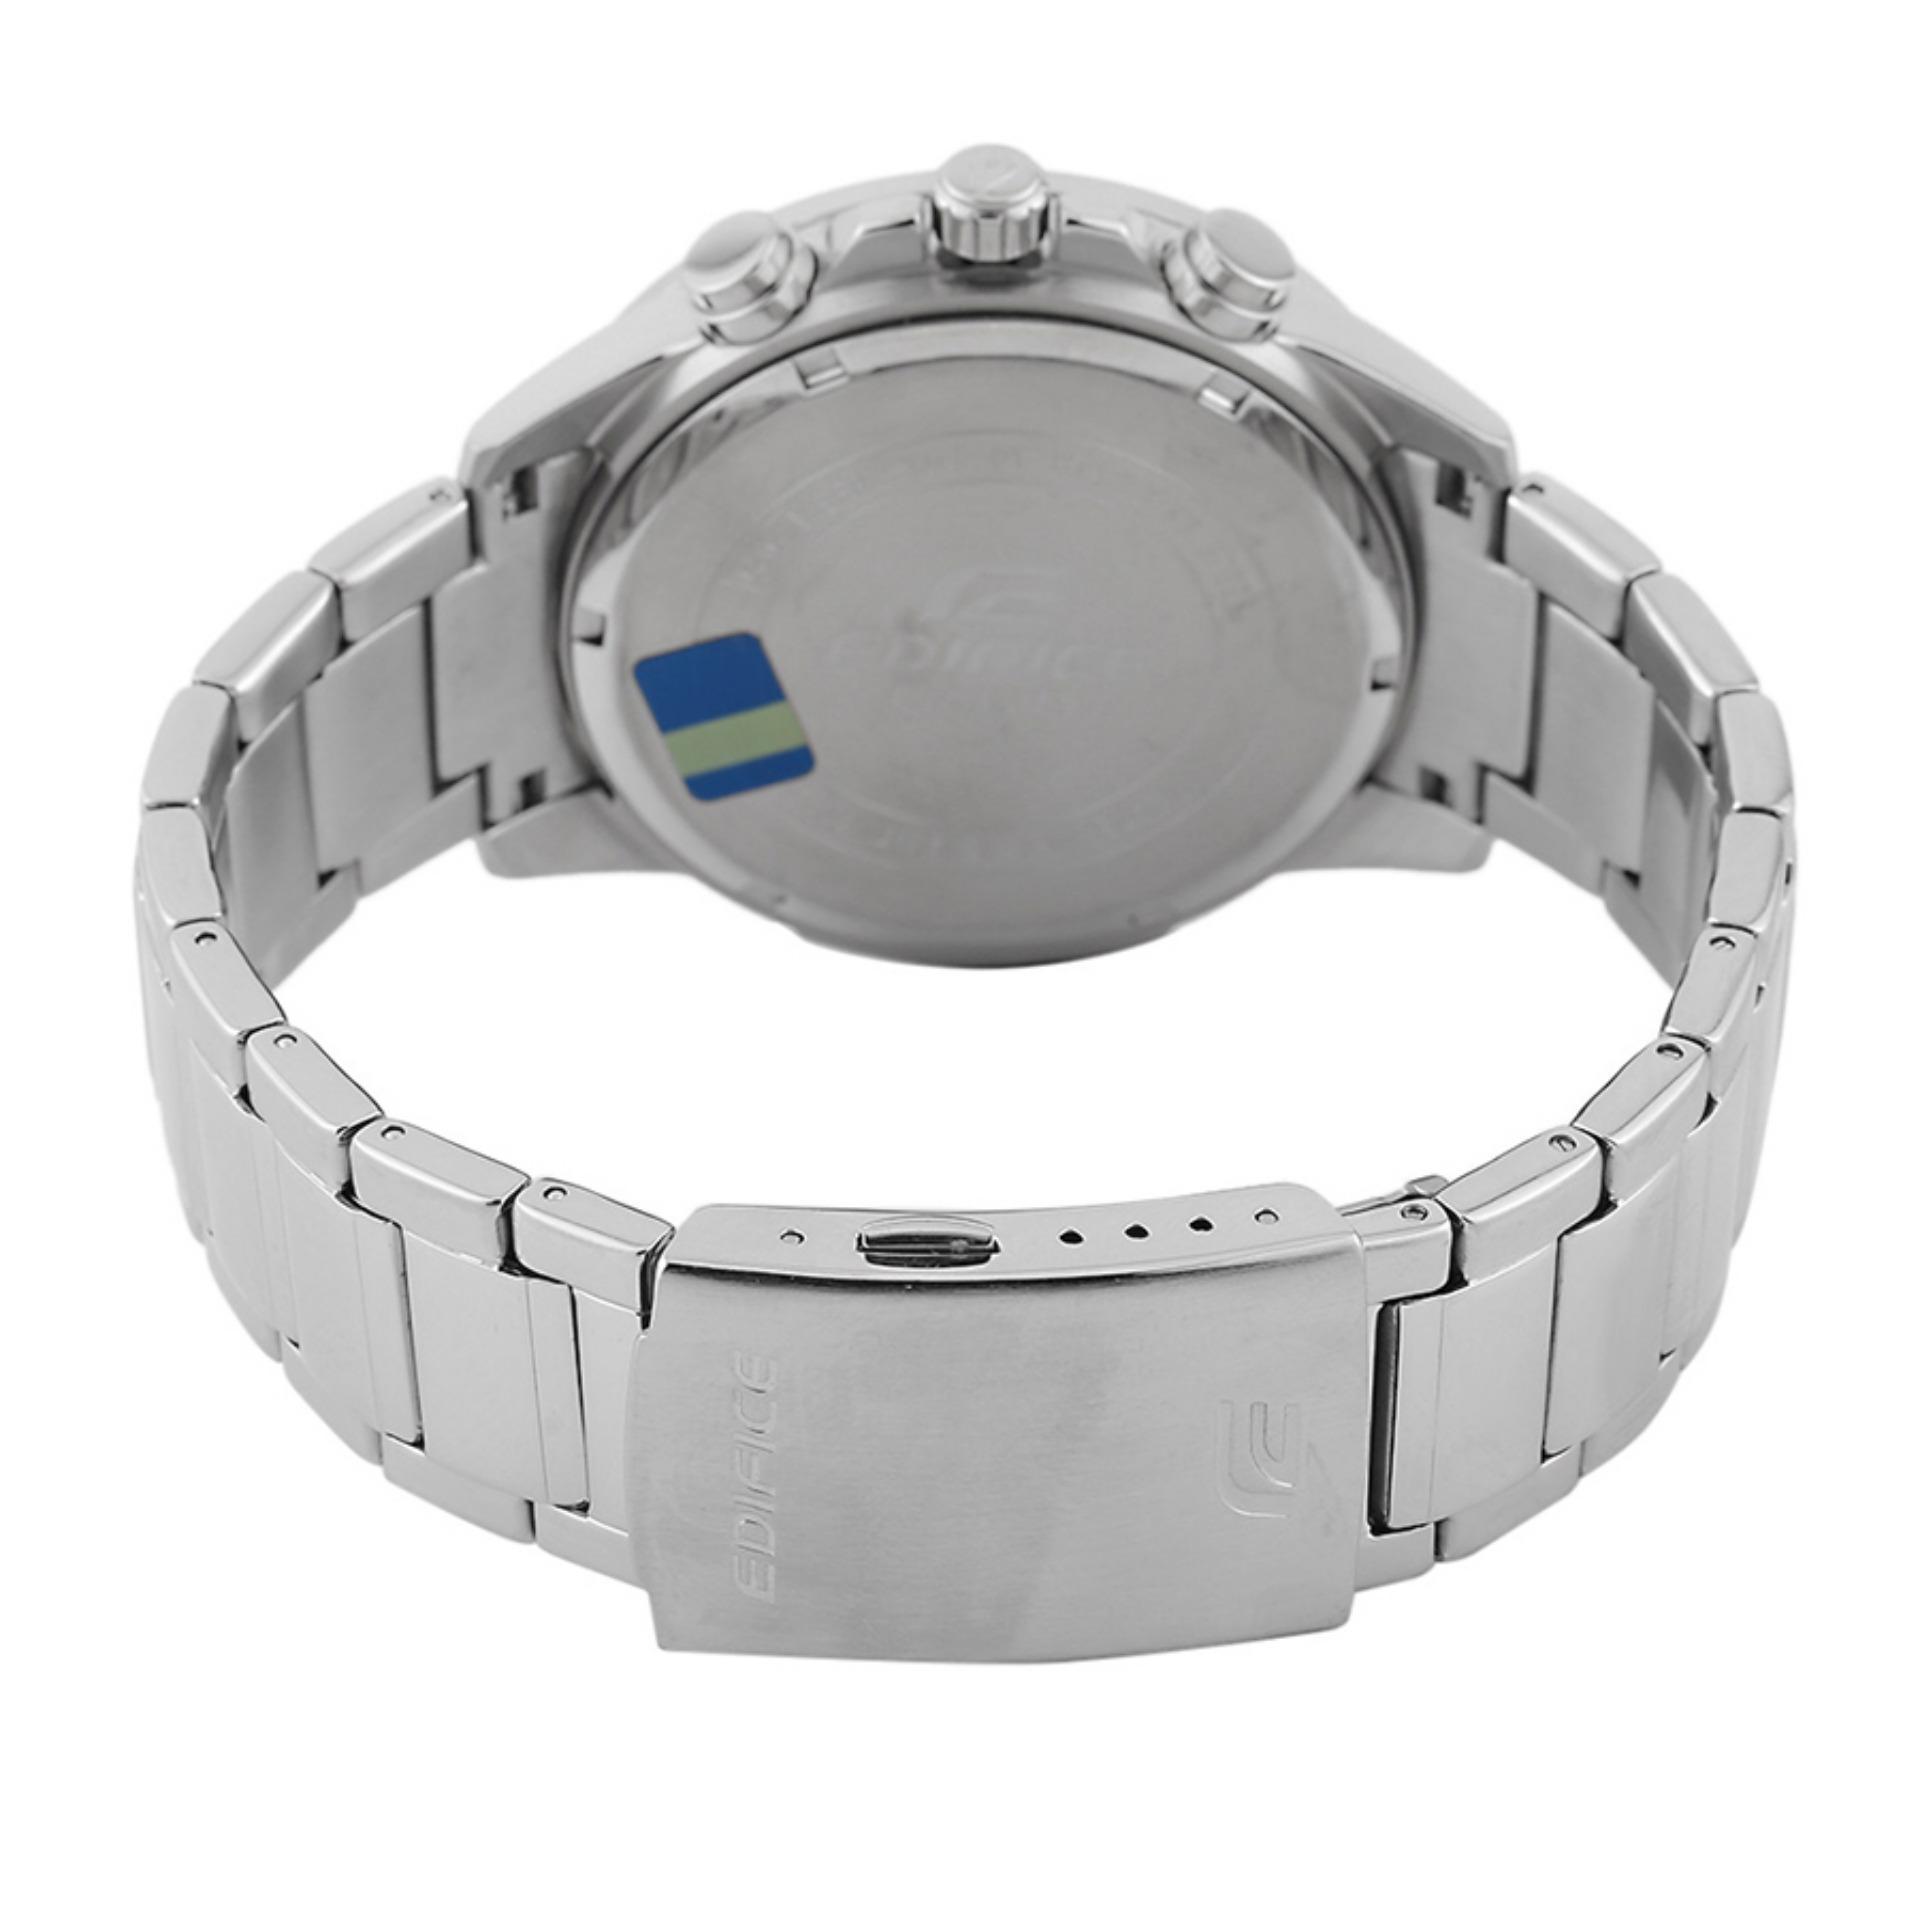 Bonia Jam Tangan Pria Casual Fashion Dan Formal Tesoro Dark Original Bpt191 1332c Stainless Steel Silver Casio Ediface D46h2228efr303d1avudf Chronograph Chain